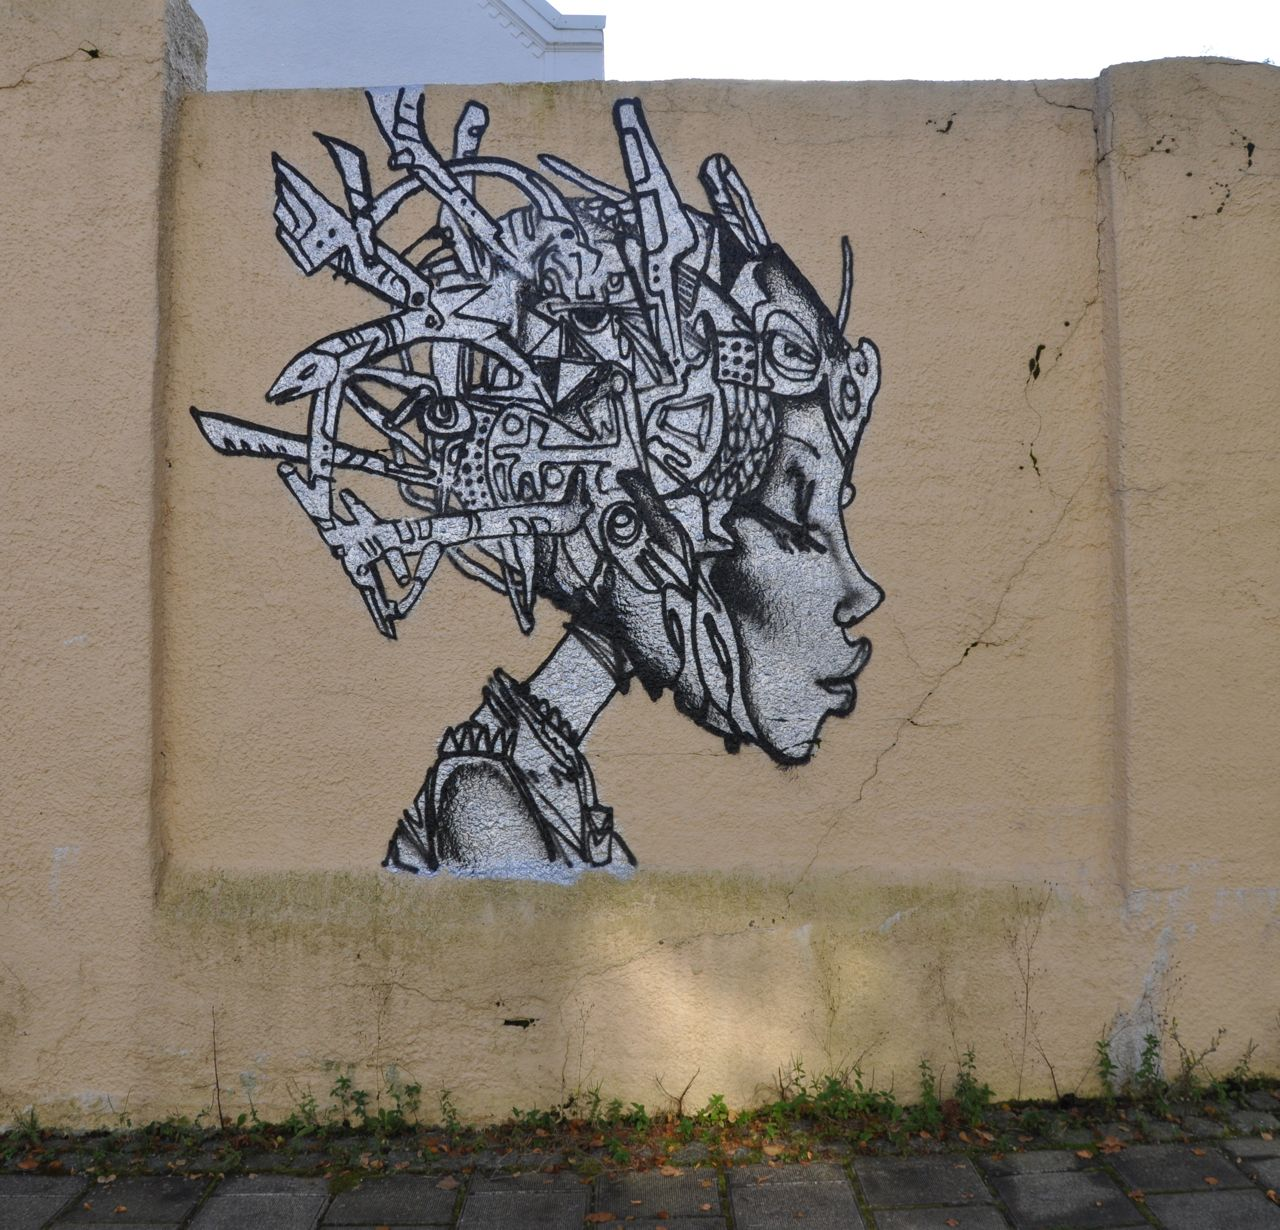 260-2011-david-choe-dvs1-street-art-nuart-festival-20.jpg